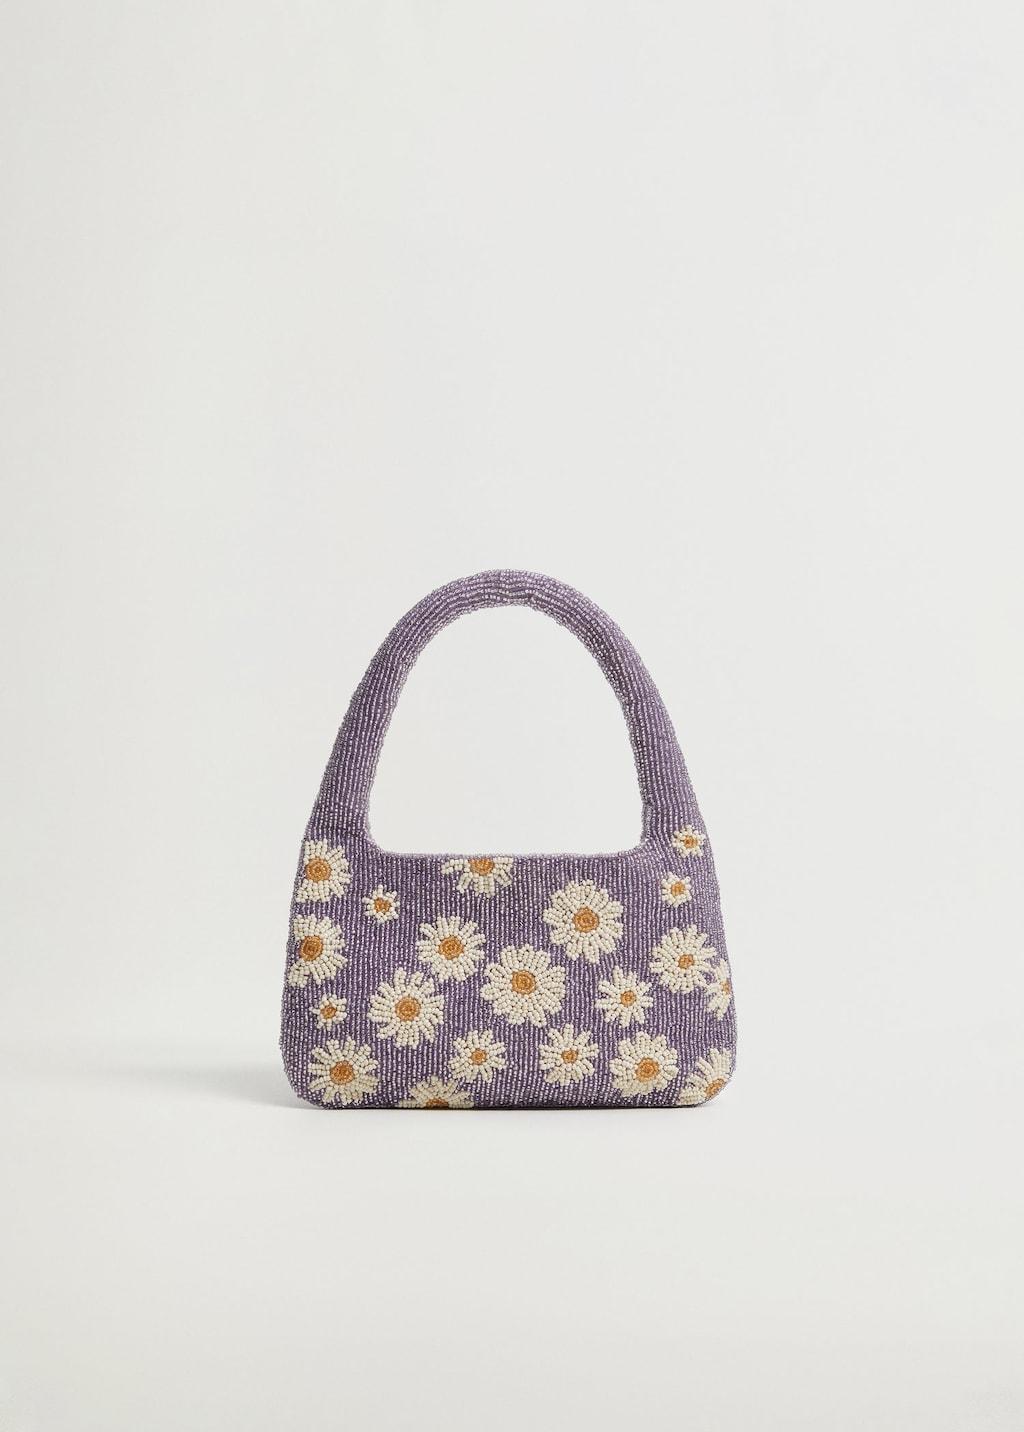 Mini sac petites perles fleurs